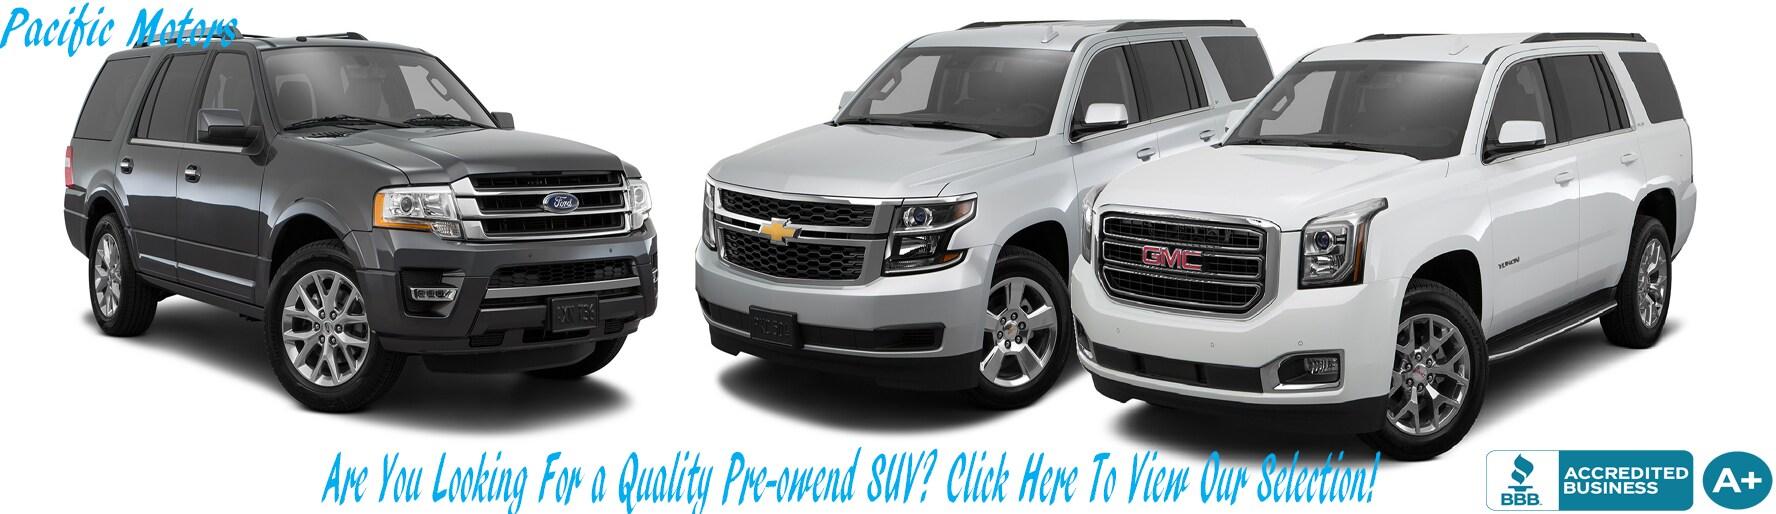 Pacific Motors   Used Car, Truck, Van & SUV dealer in Winnipeg ...